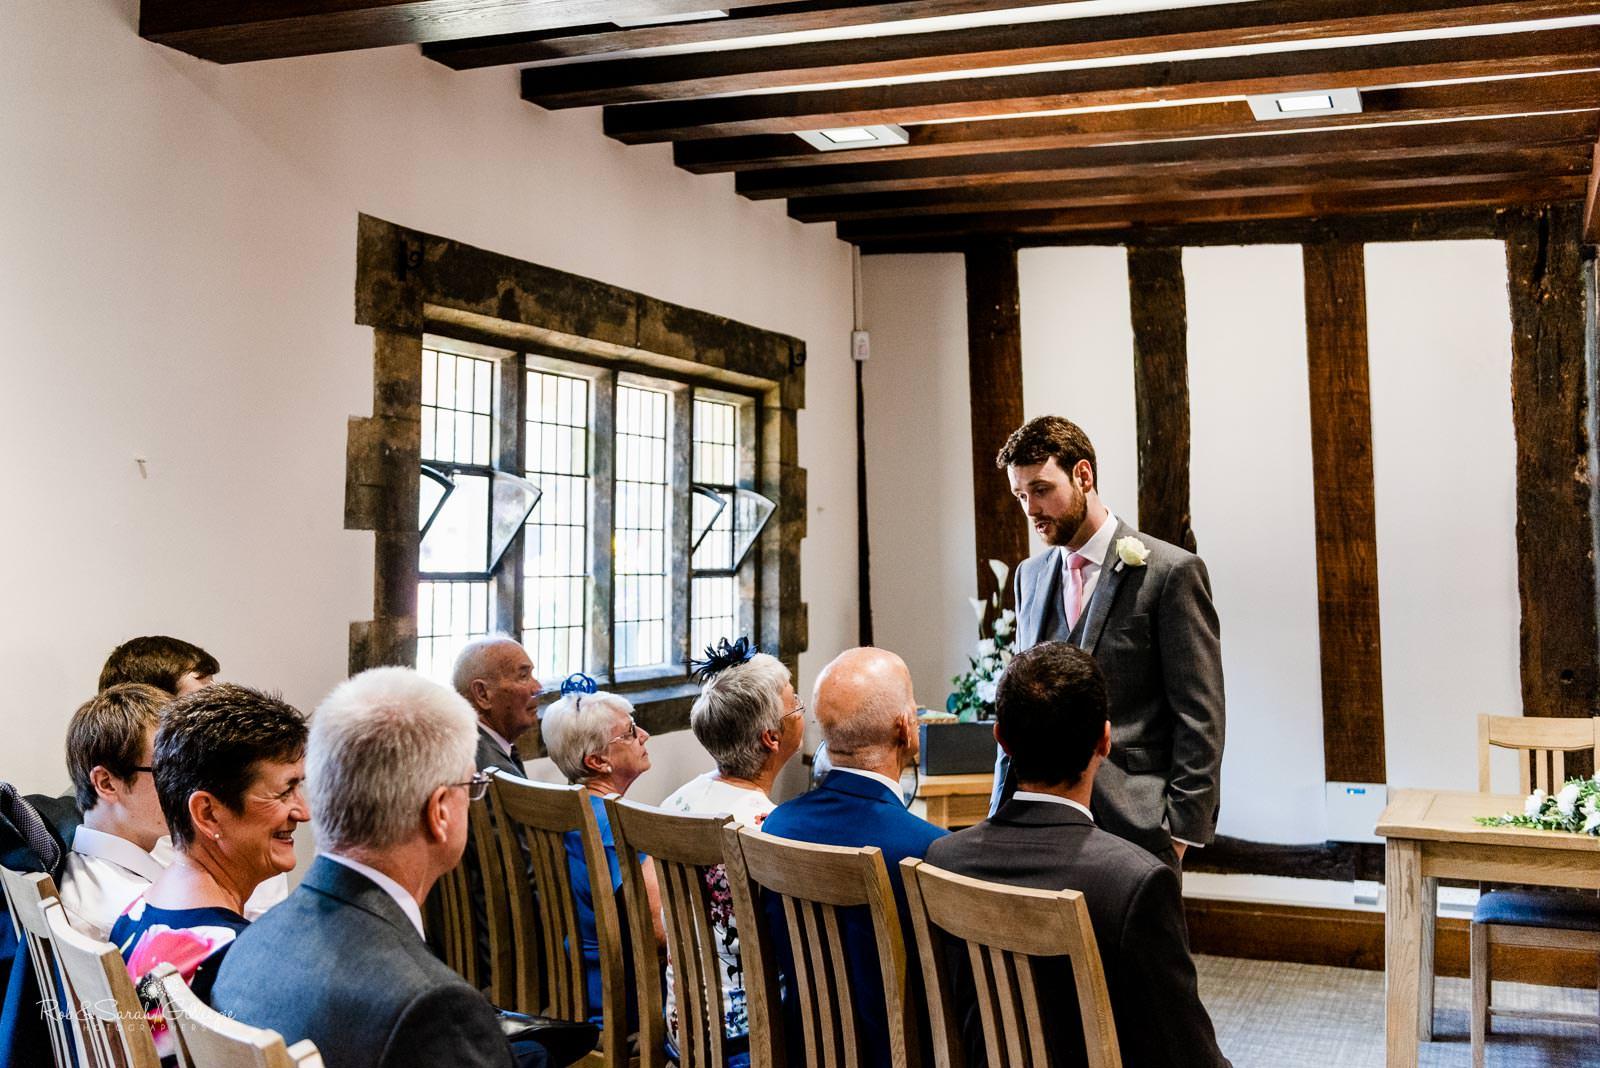 Wedding at Henley Rooms in Stratford upon Avon